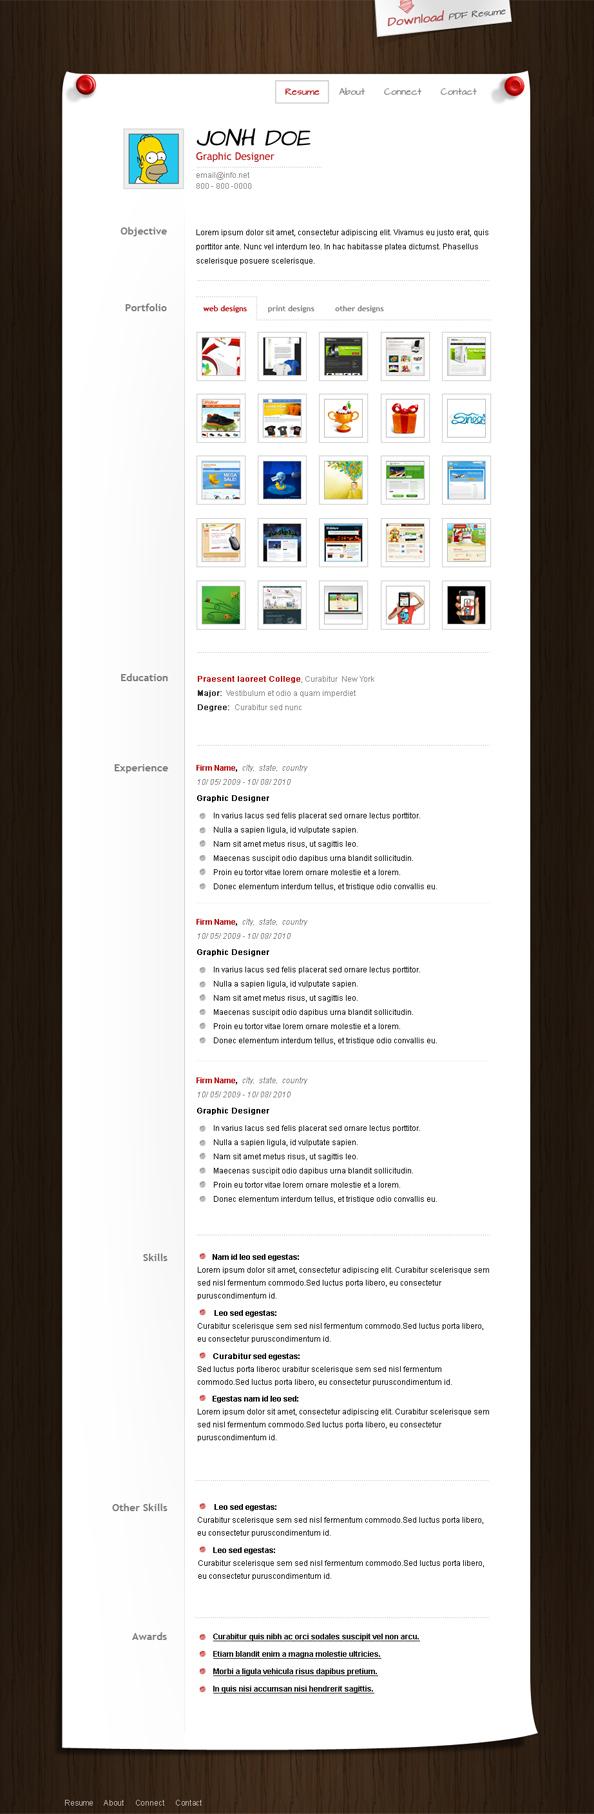 PSD GRATIS: Curriculum Vitae CV u Hoja de Vida para web secciones ...